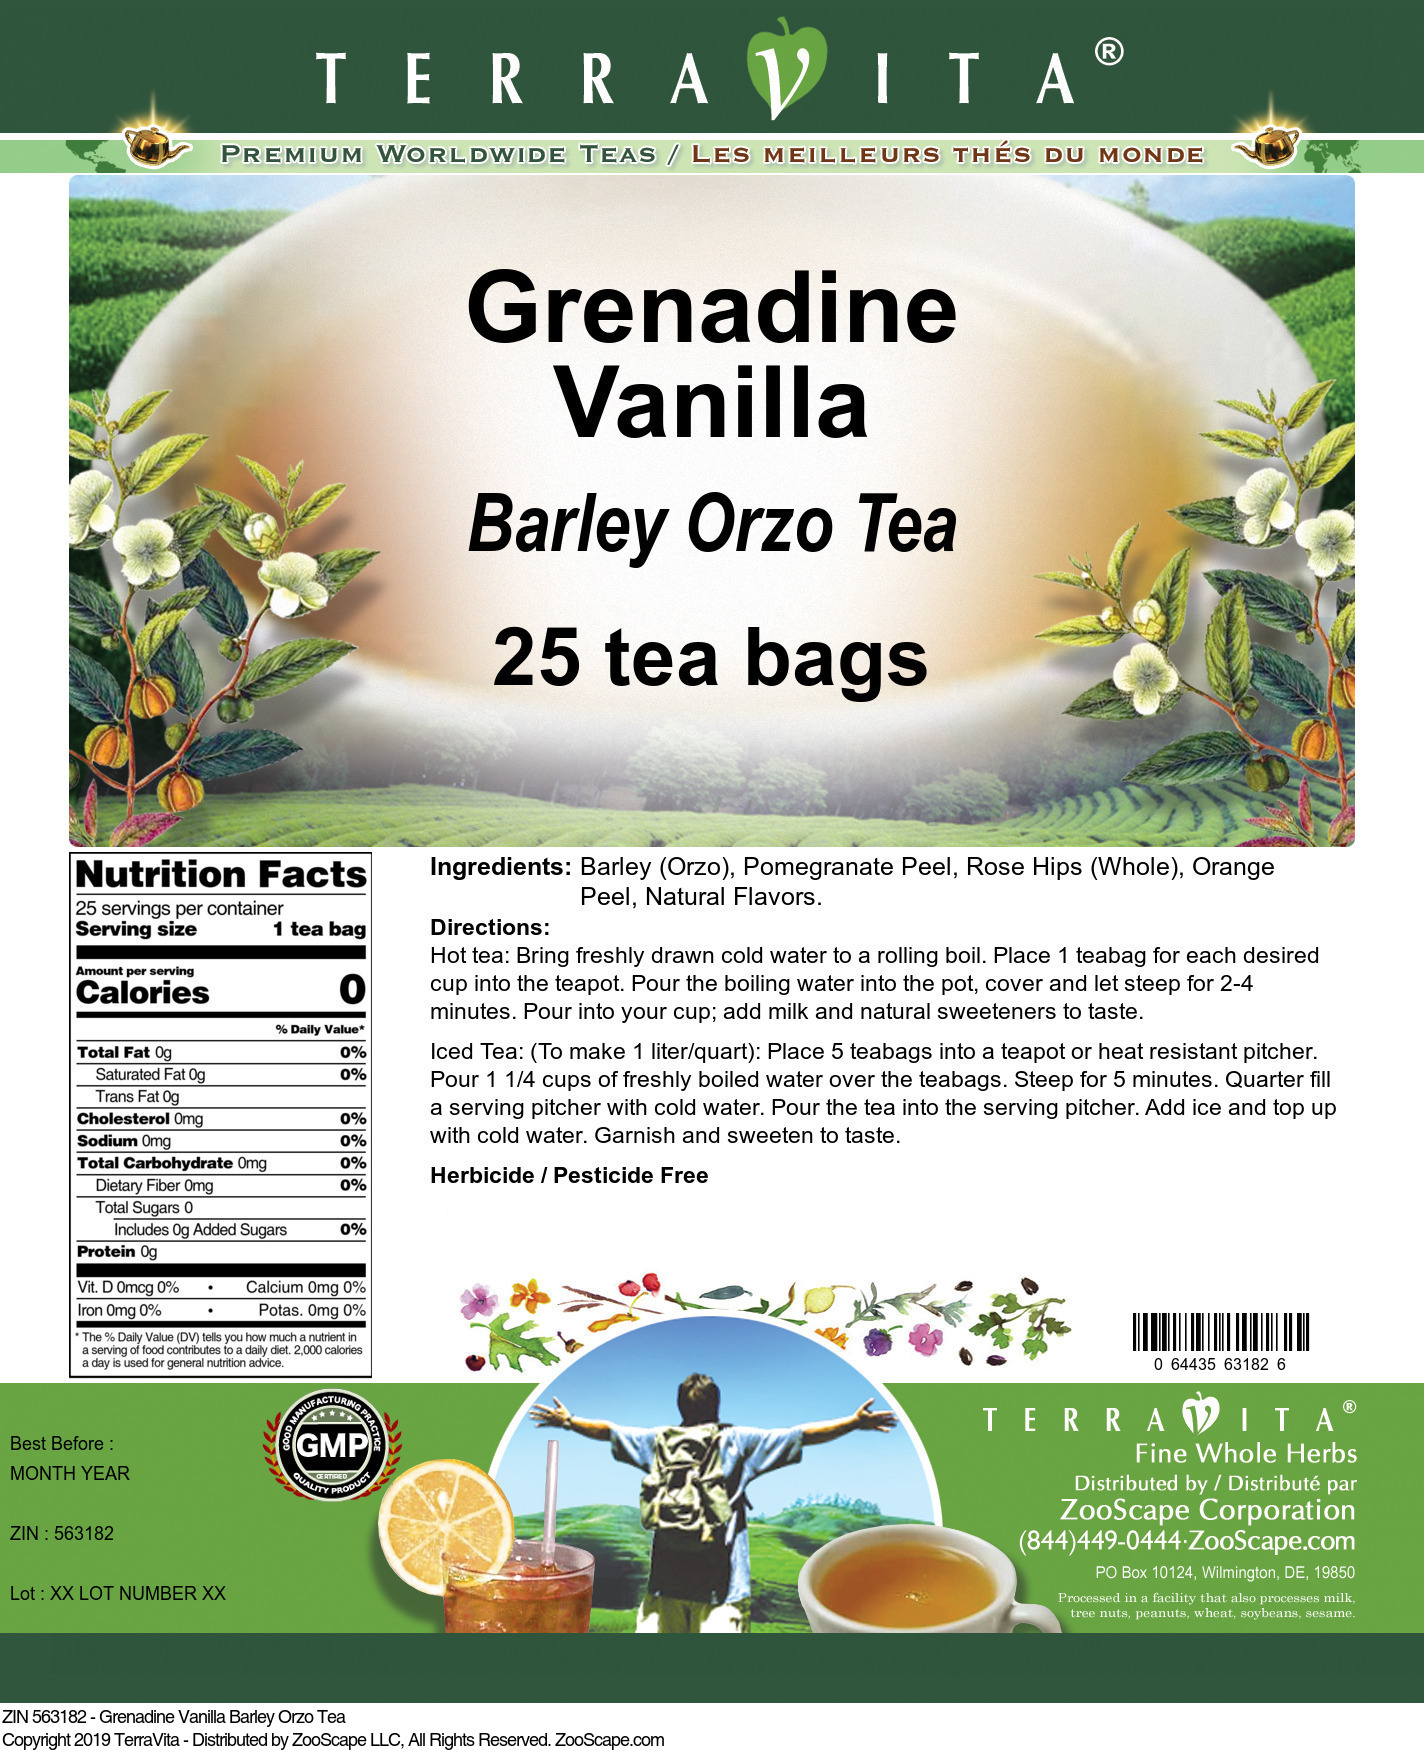 Grenadine Vanilla Barley Orzo Tea